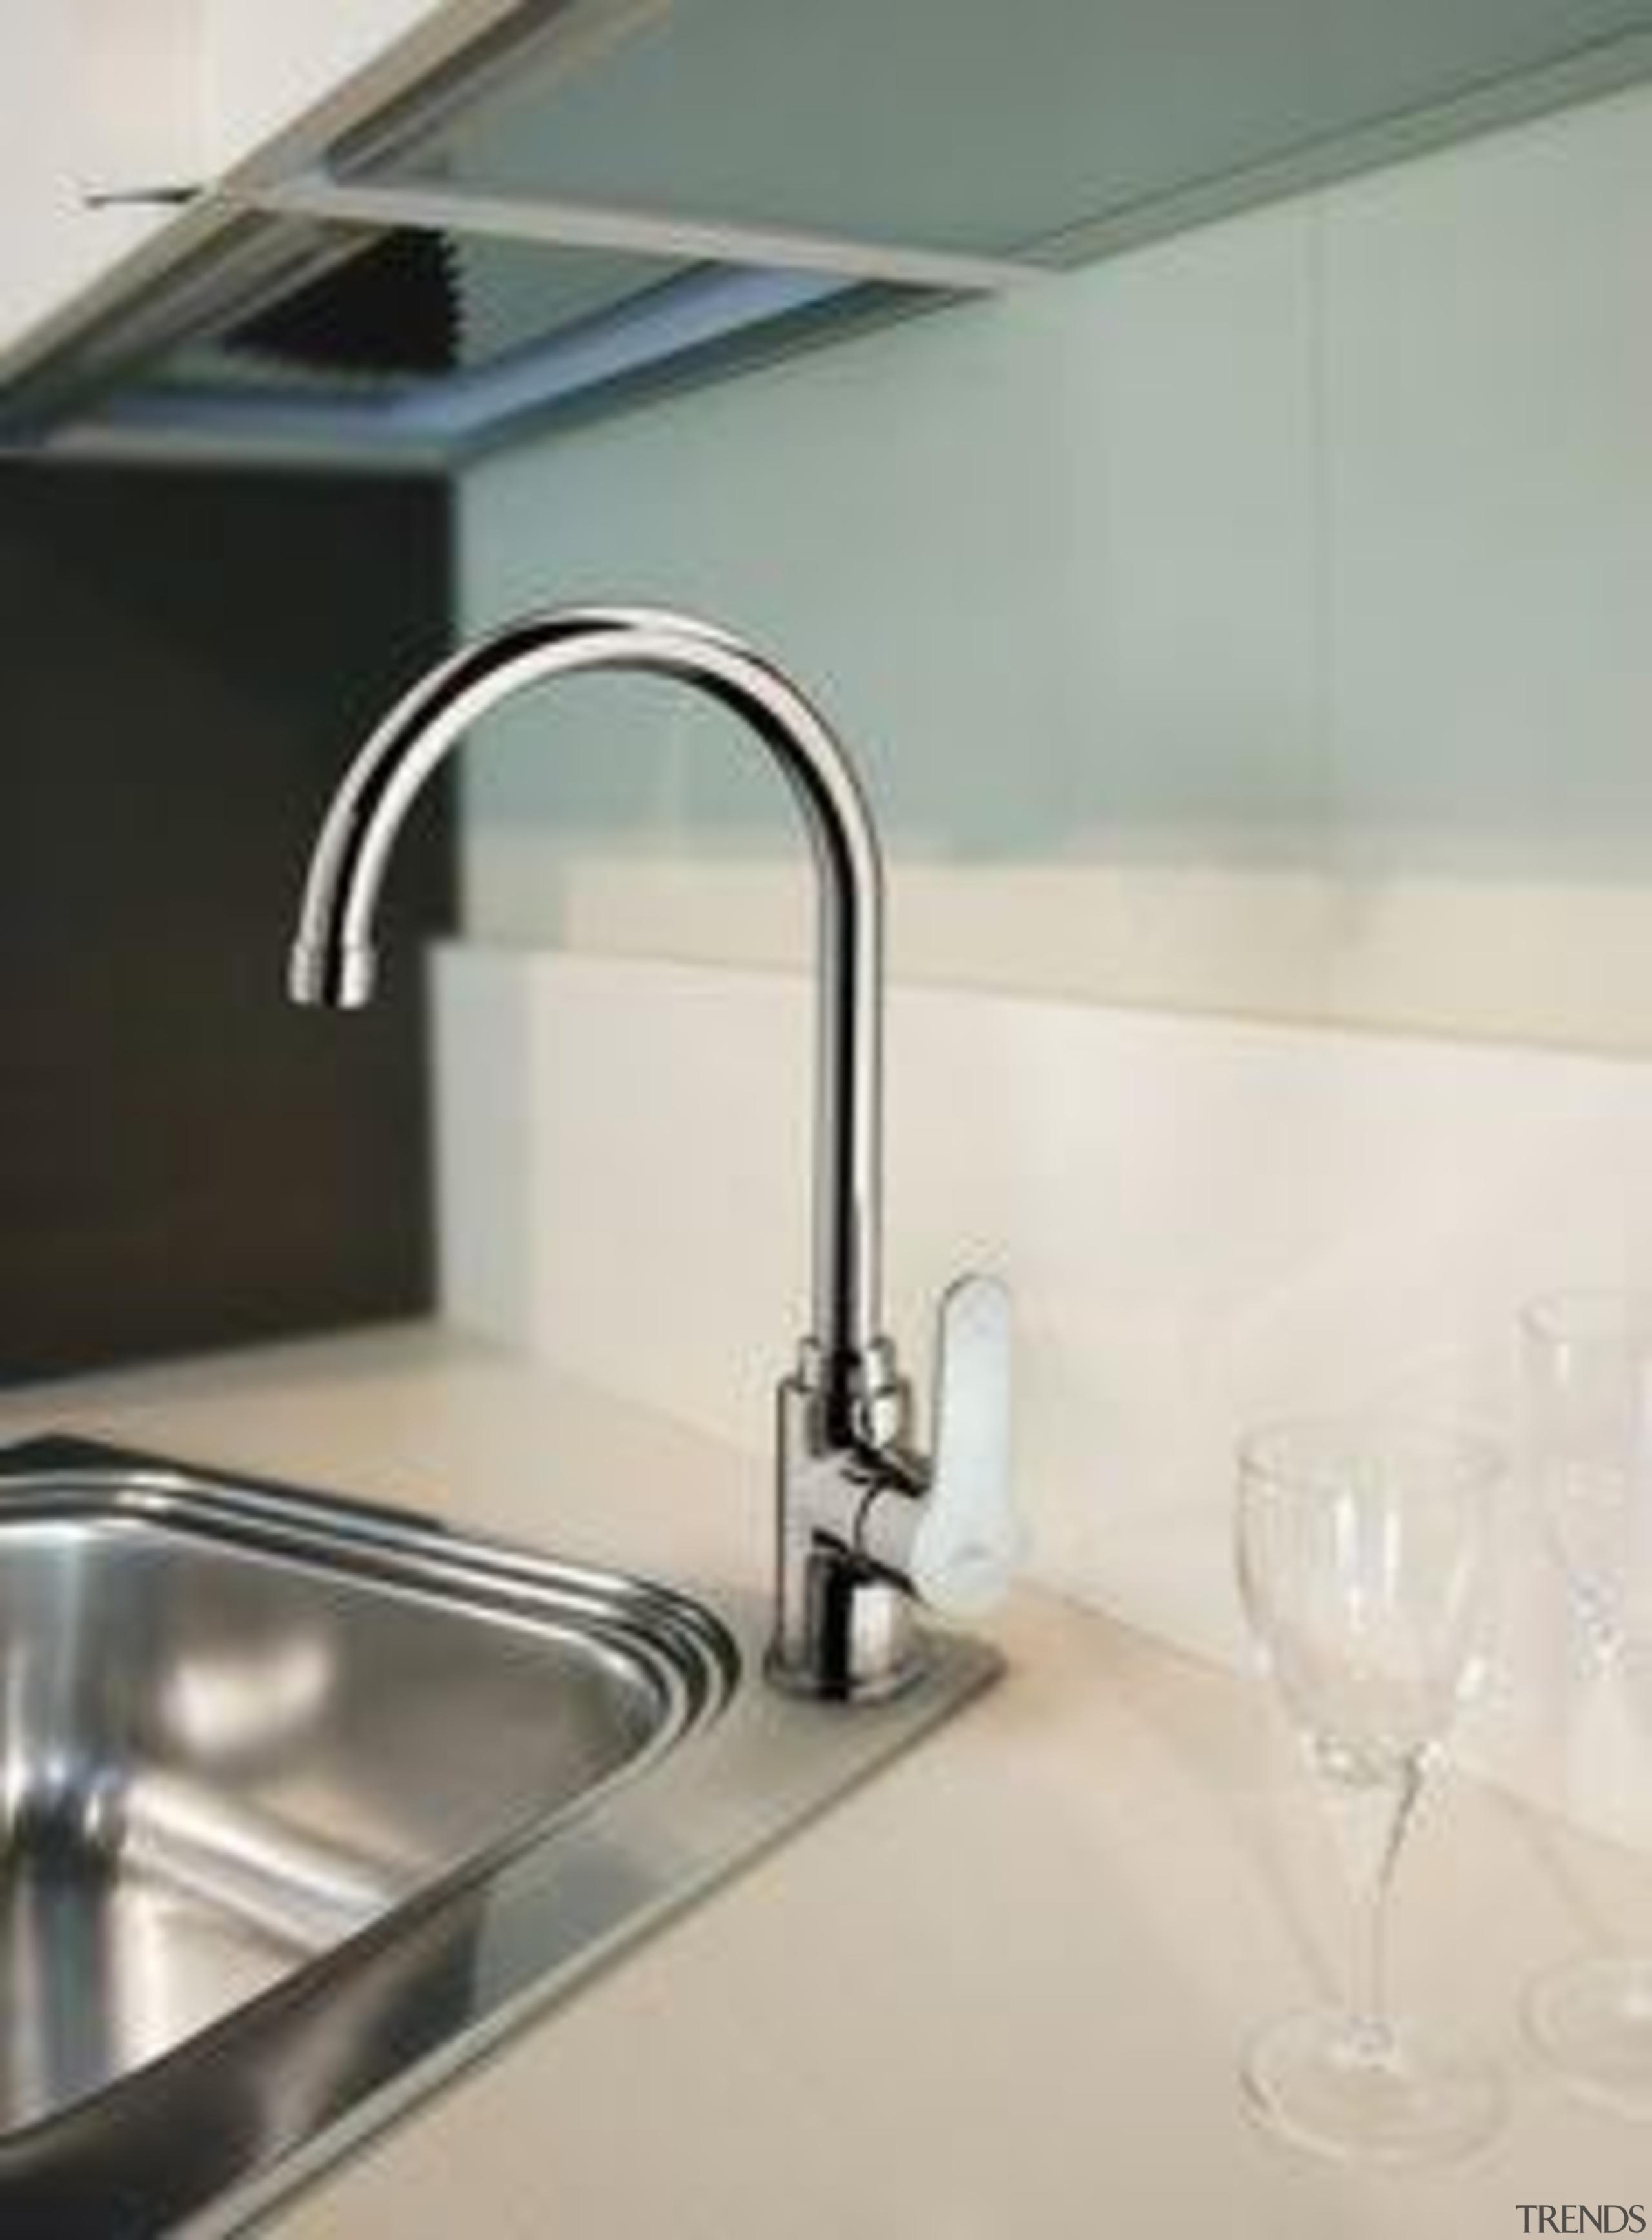 Paffoni Blu Sink Gooseneck Kitchen Mixer - My bathroom sink, countertop, plumbing fixture, product design, sink, tap, white, gray